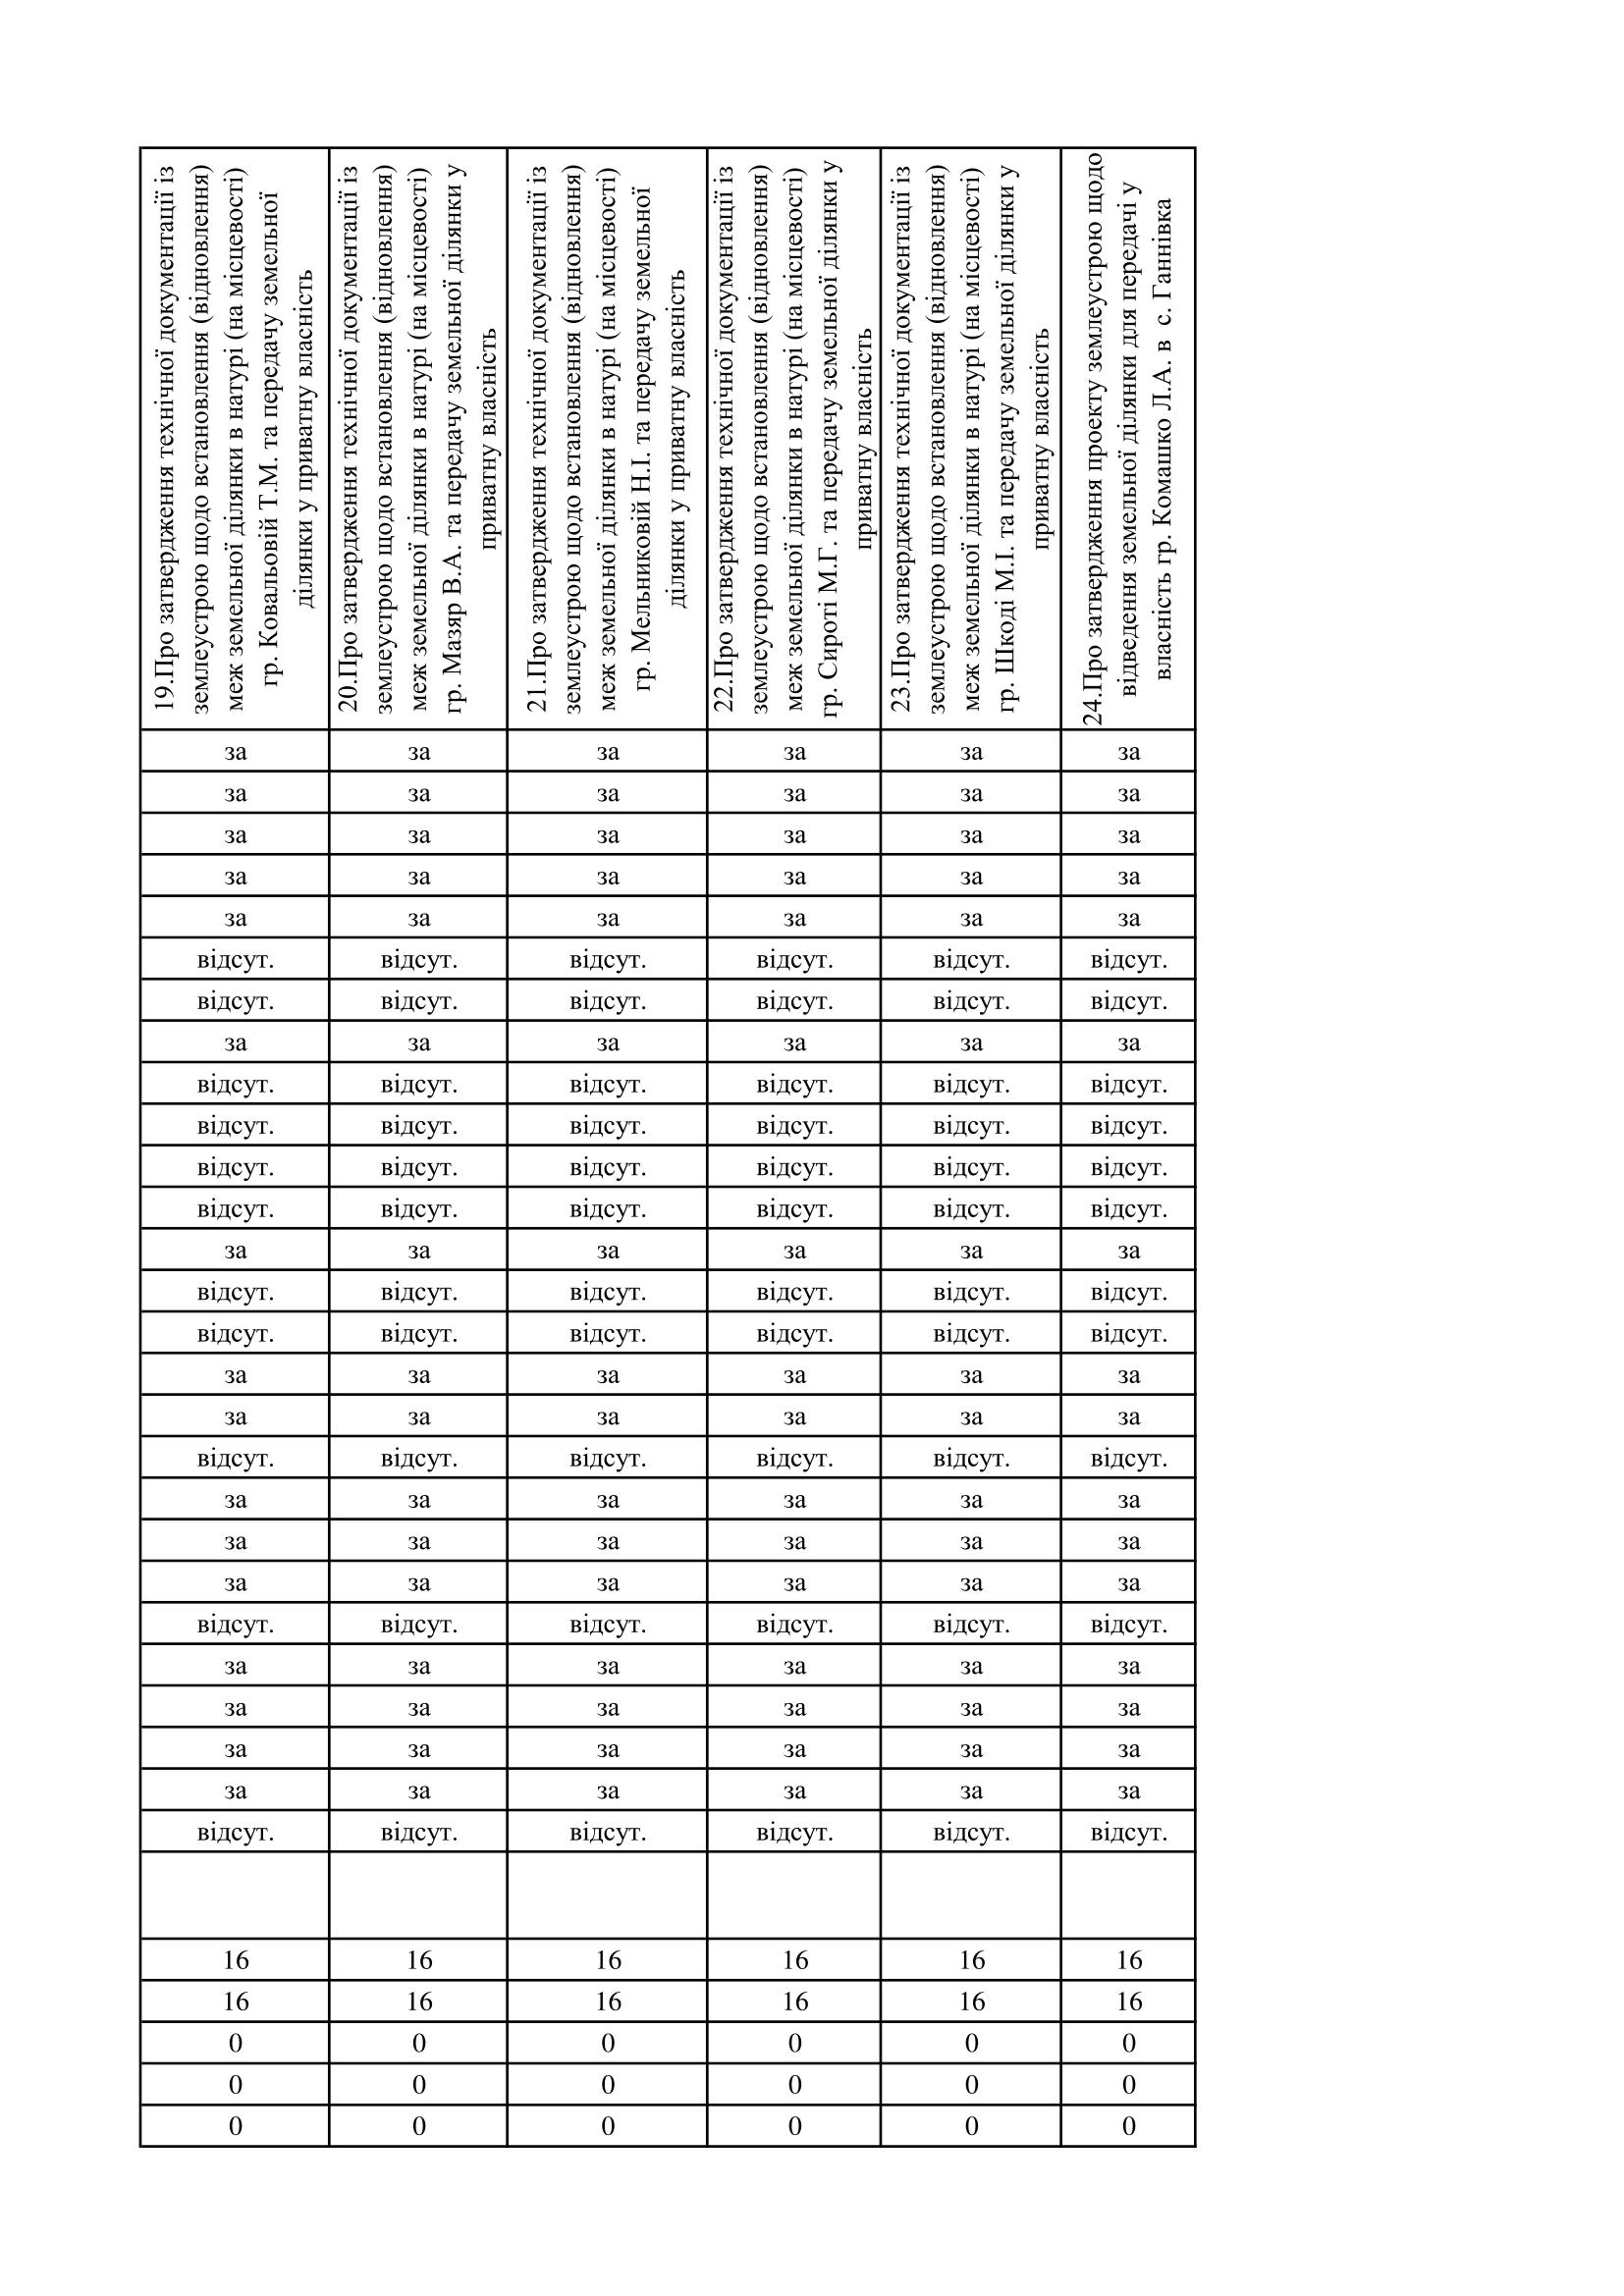 http://gradizka-rada.gov.ua/wp-content/uploads/2017/03/поіменне-голосування-4.png